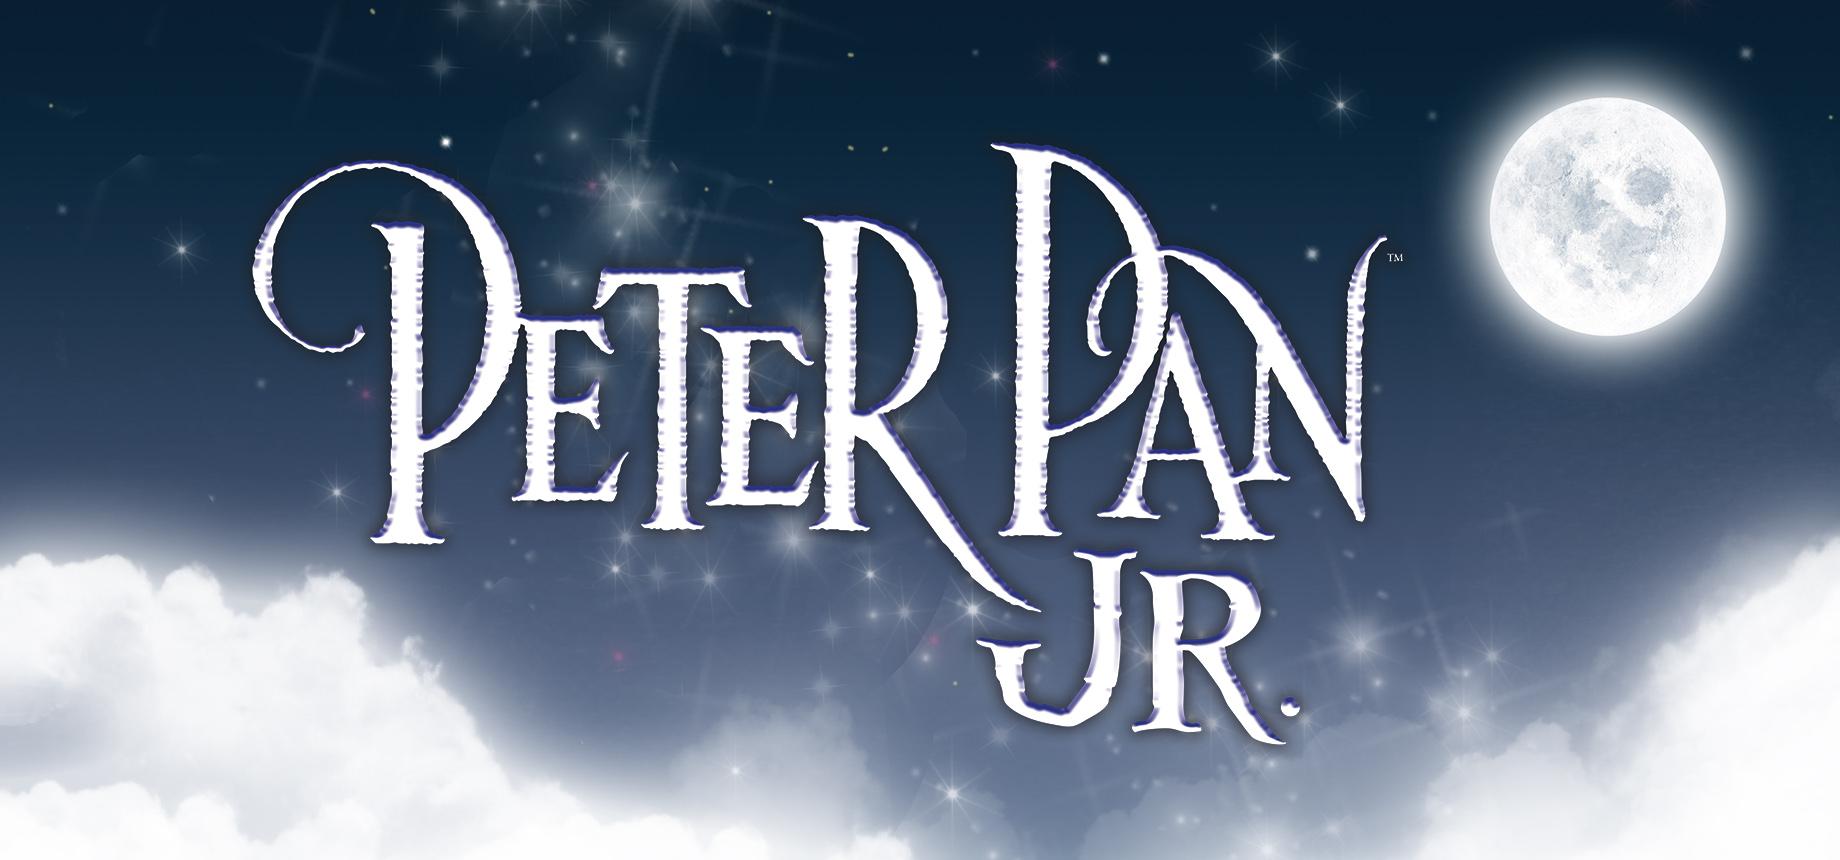 Don't miss Peter Pan Jr. Coming this April!